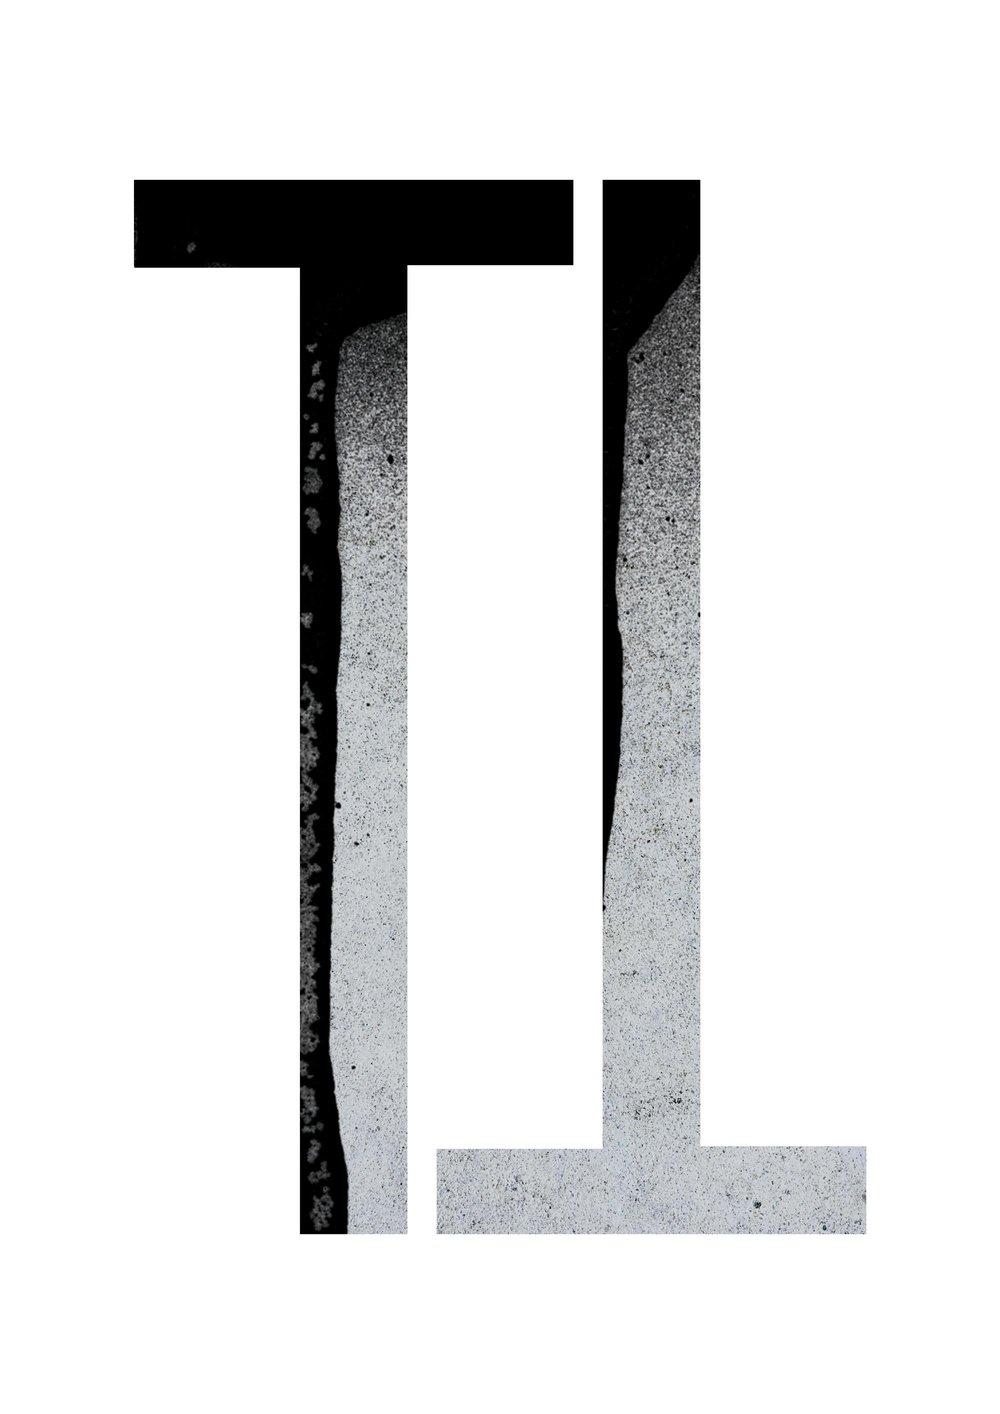 TT_ConcreteLogo-V1A copy.jpg